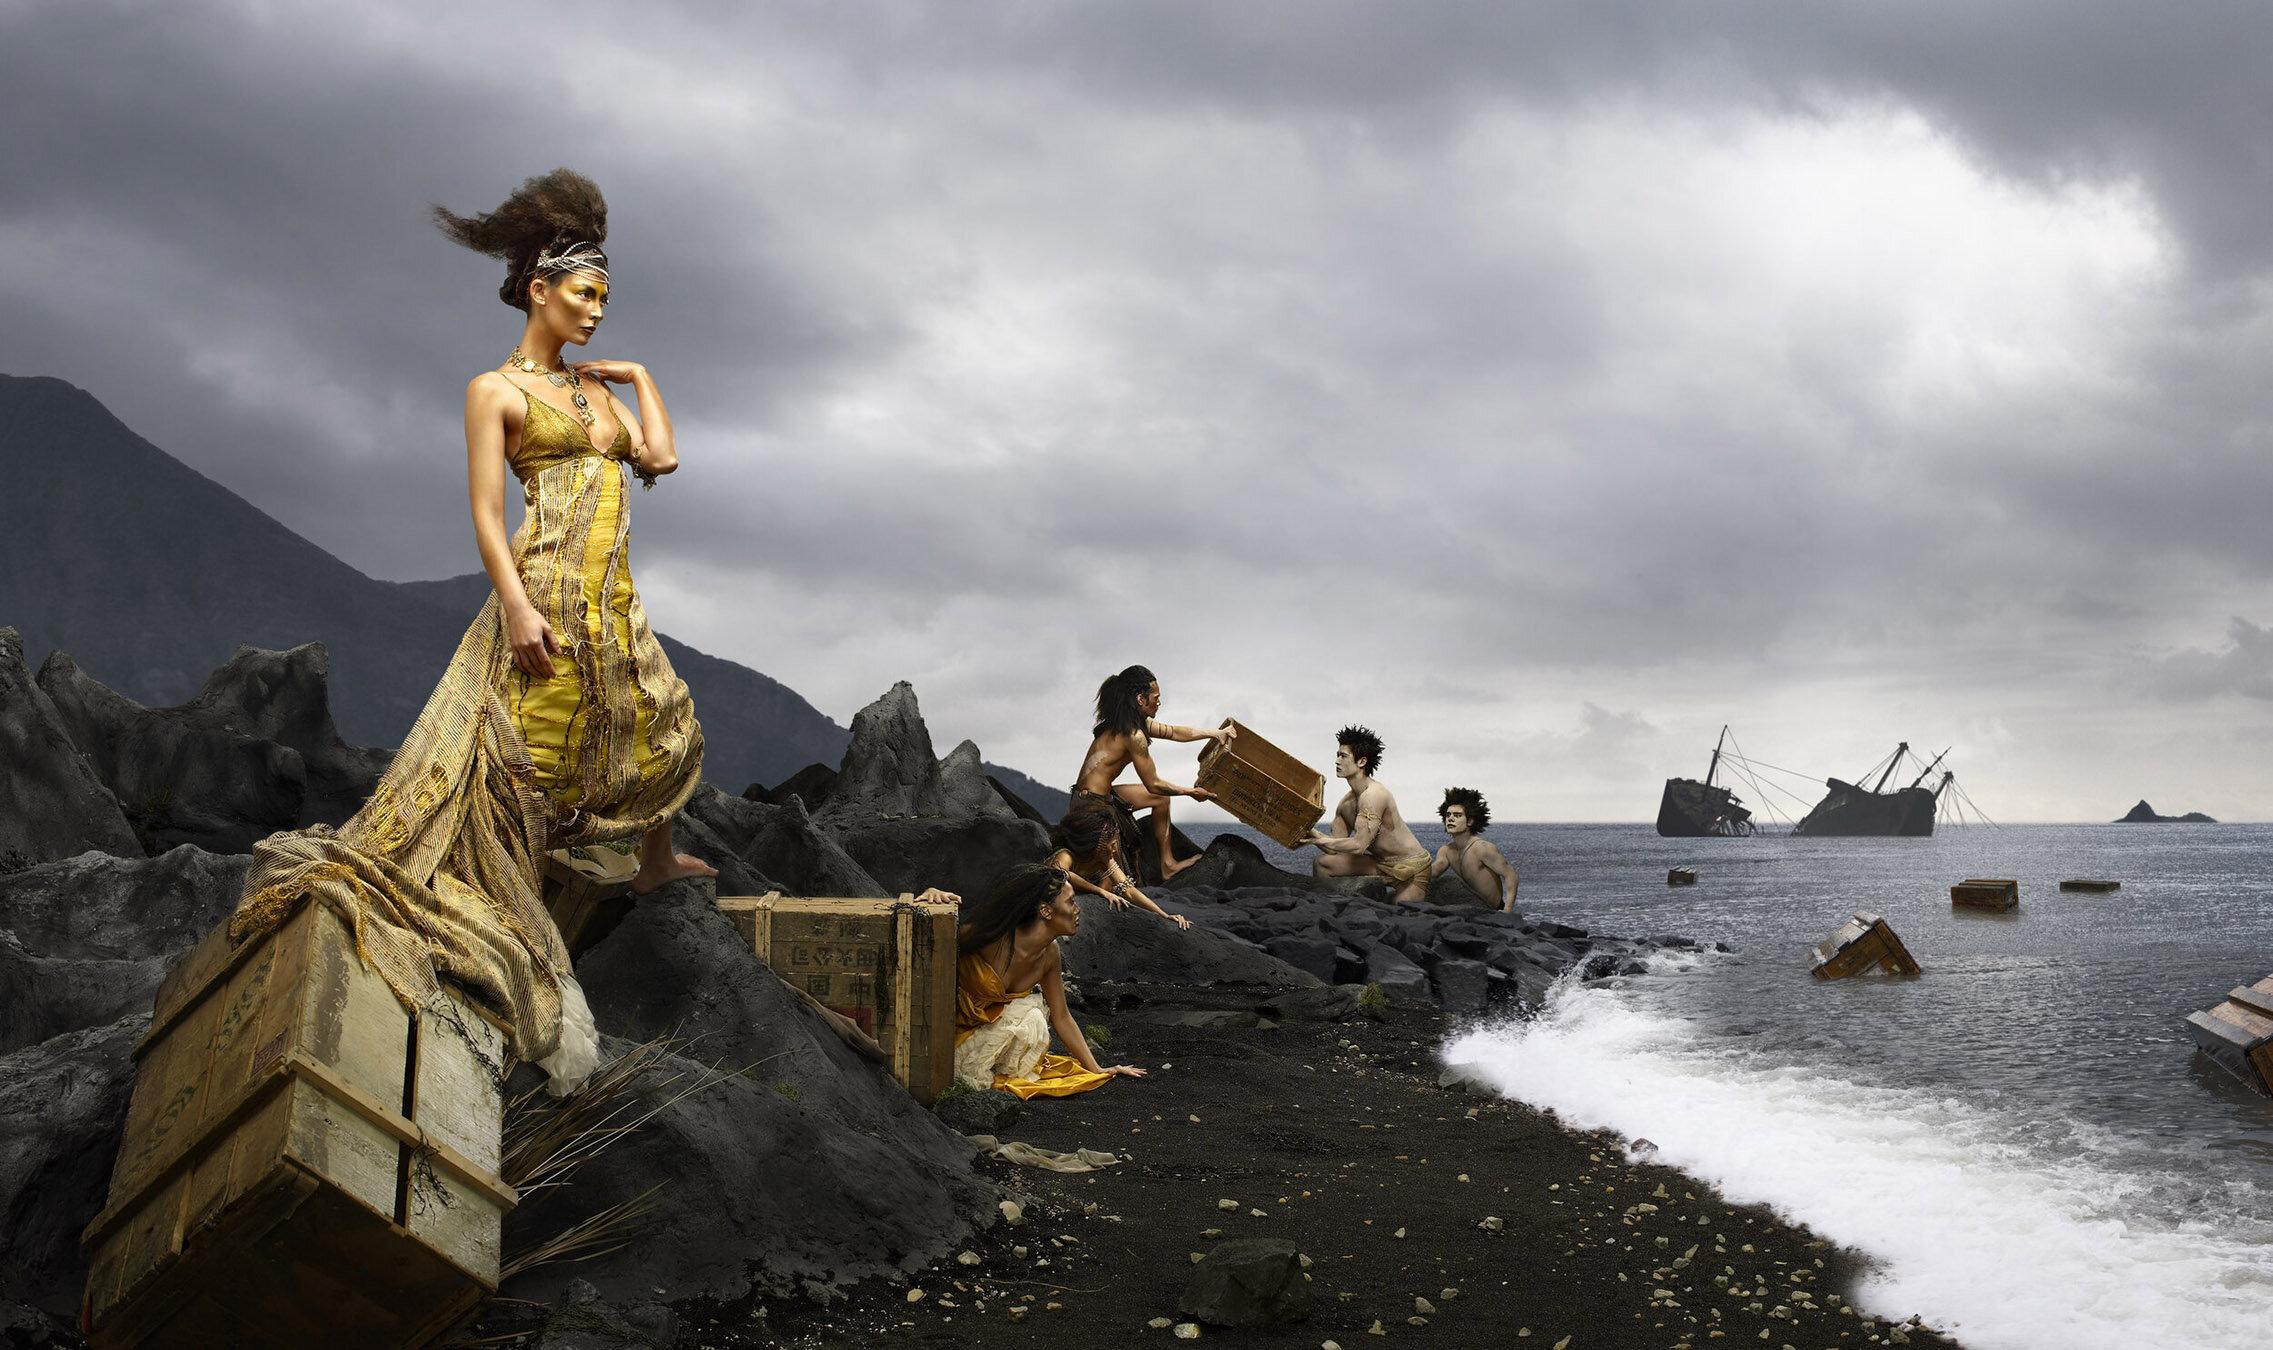 Stella Velon in the 'Lost Tribe'